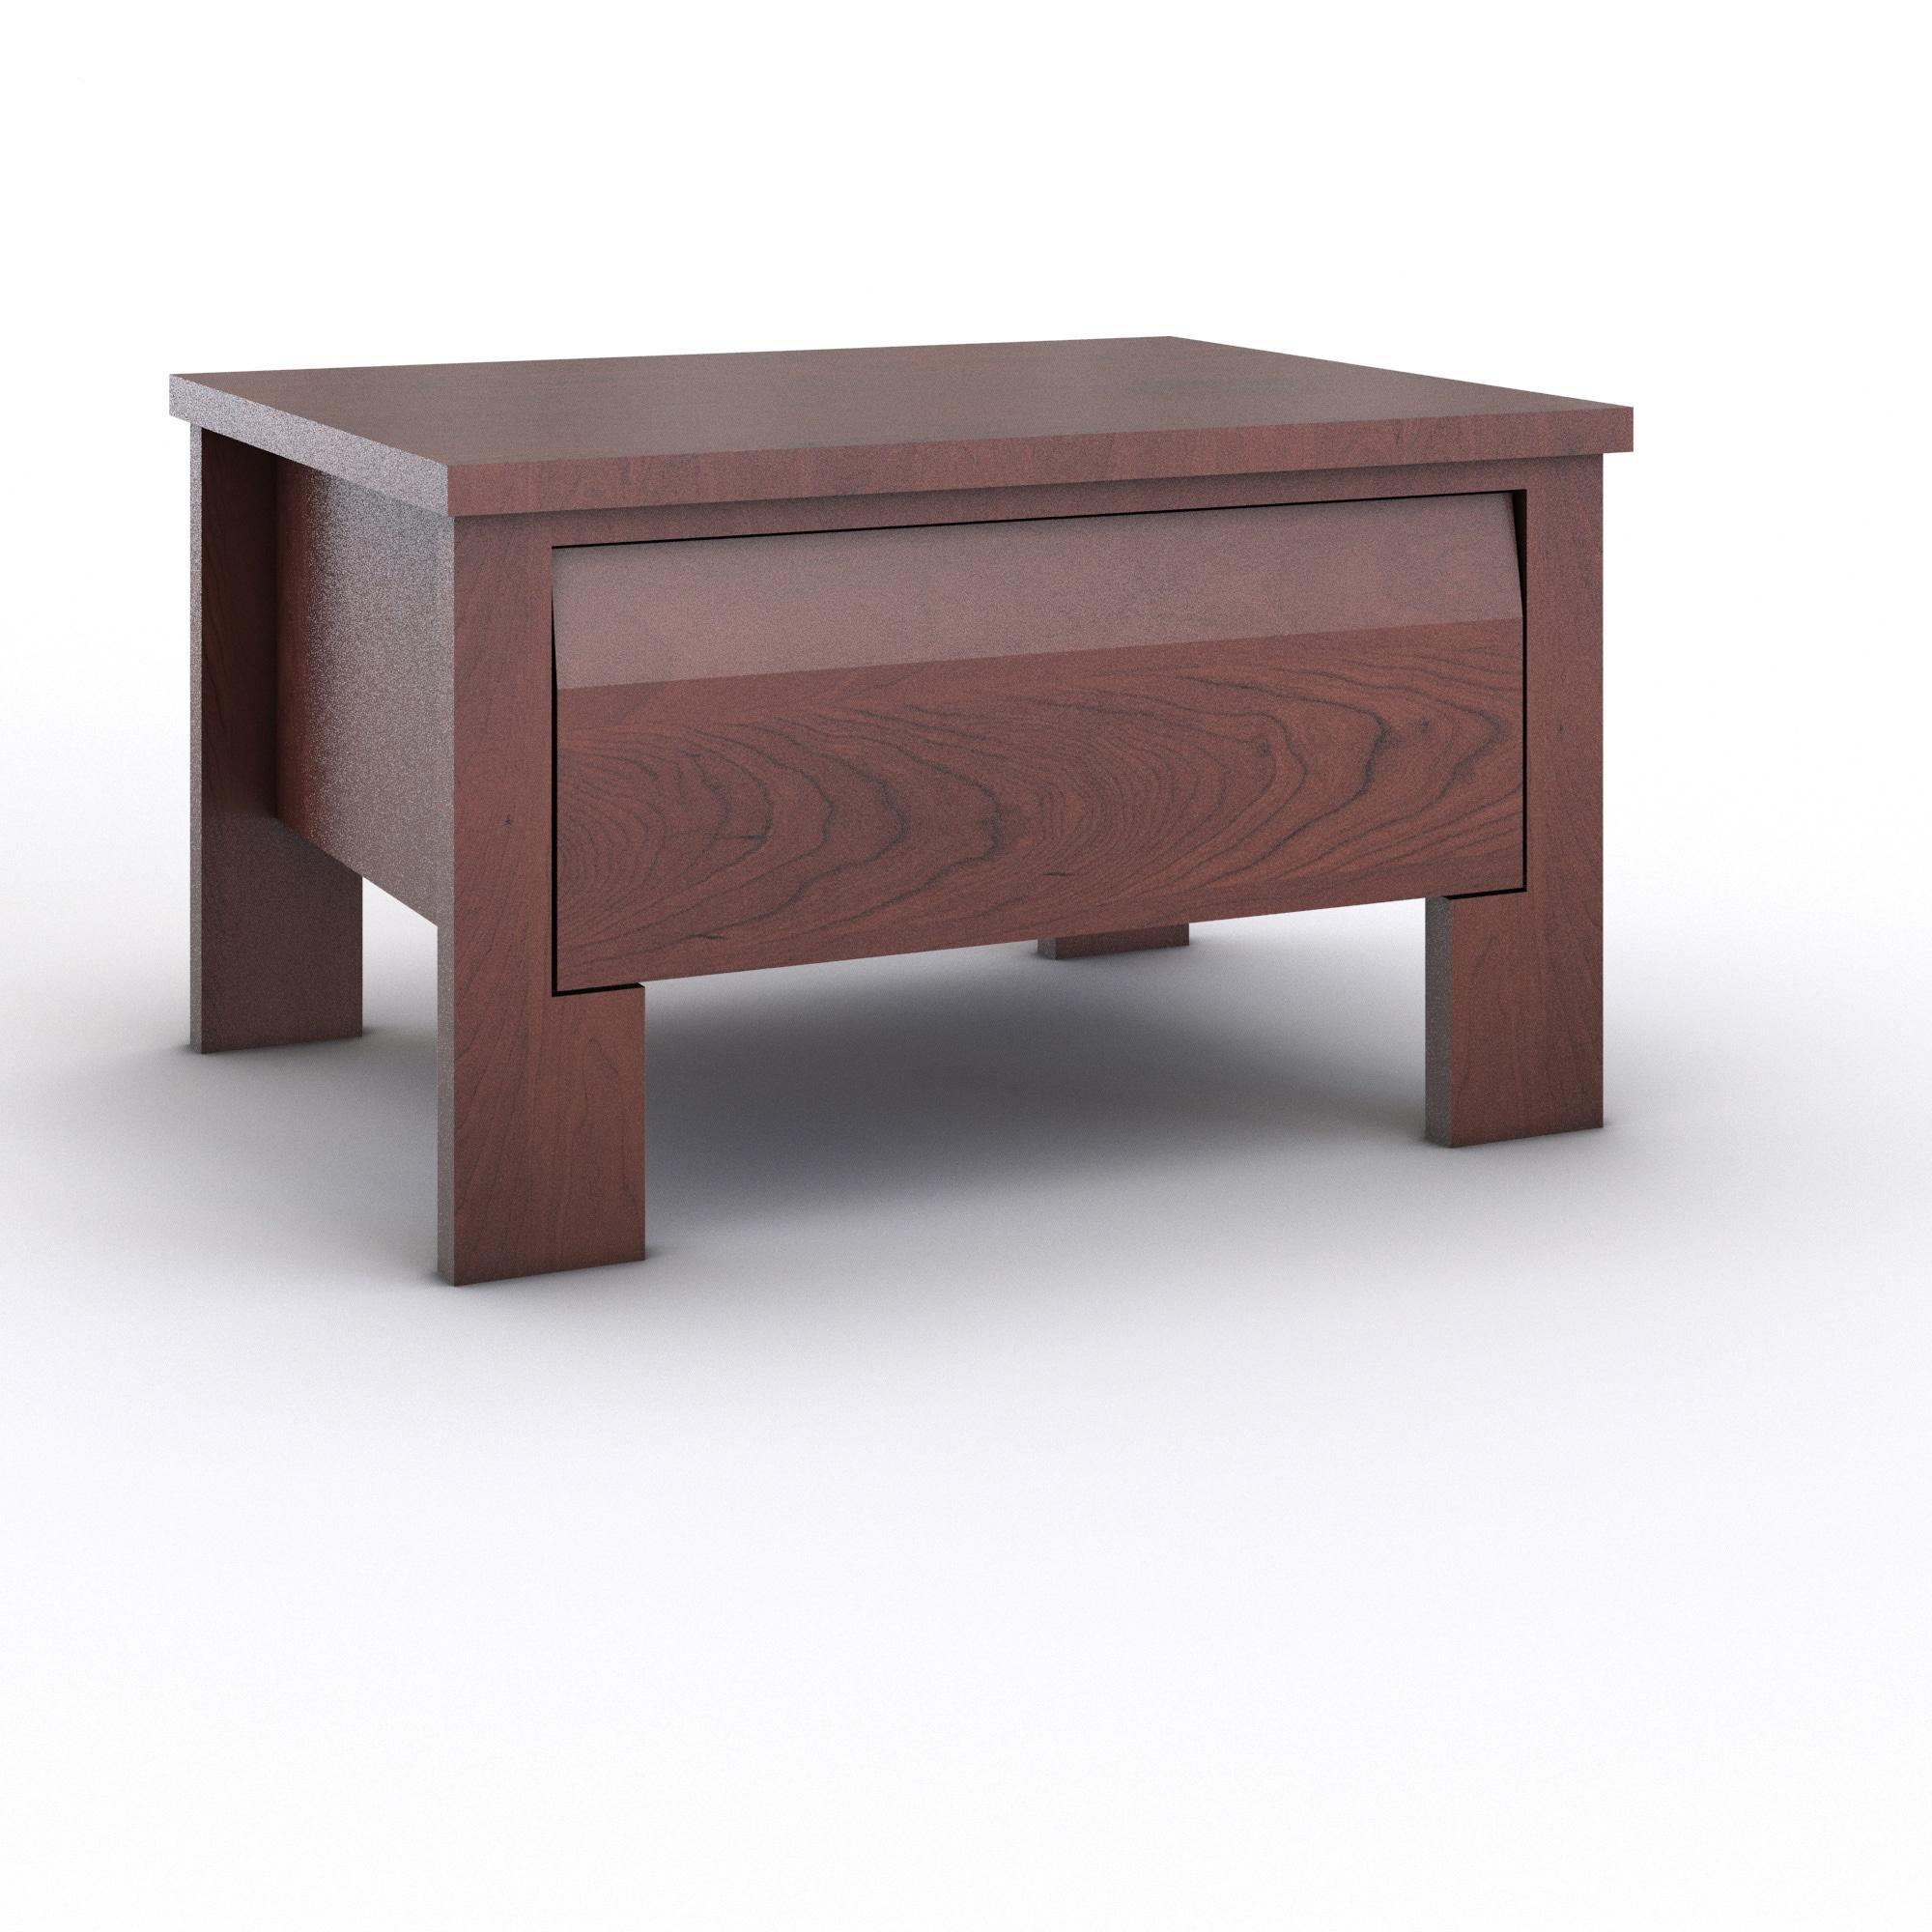 Porch & Den Rosewood Coleto 1-drawer Nightstand